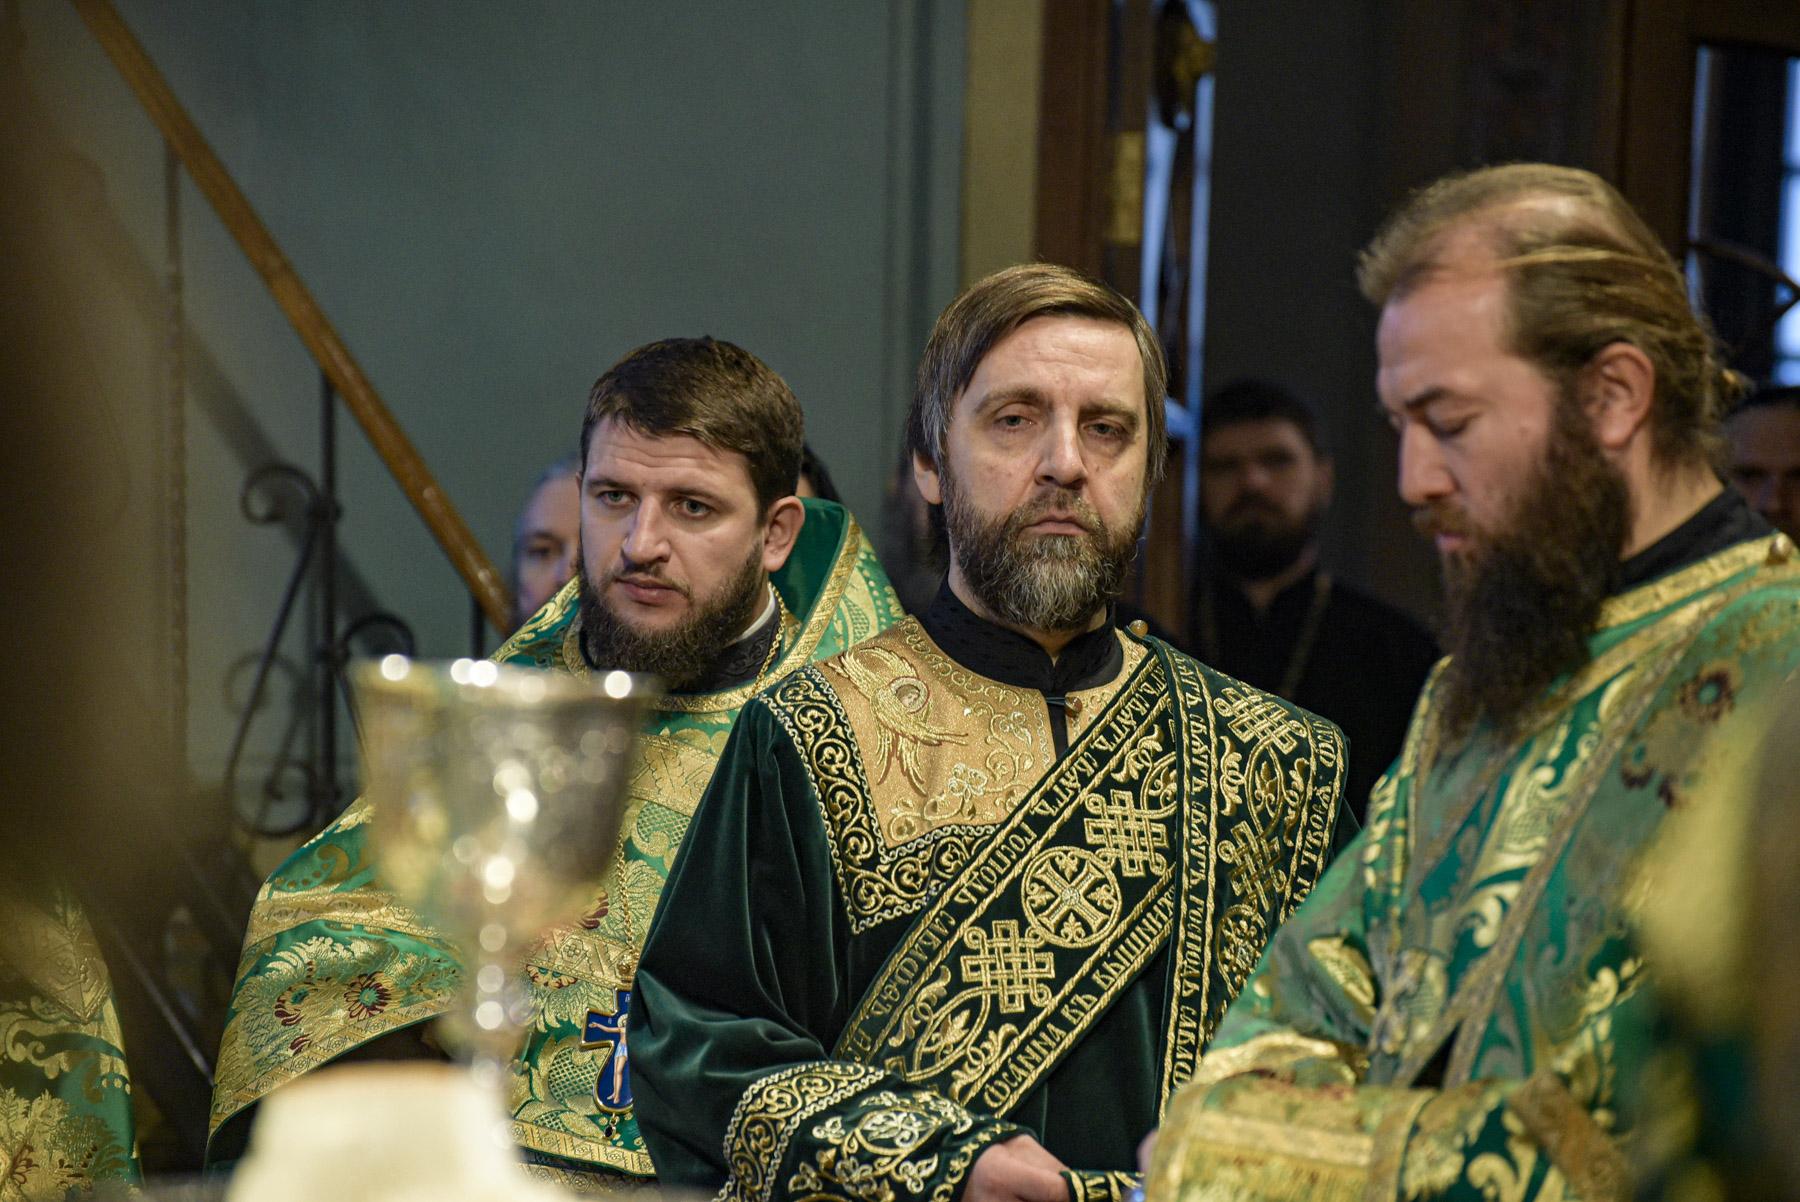 photos of orthodox christmas 0204 2